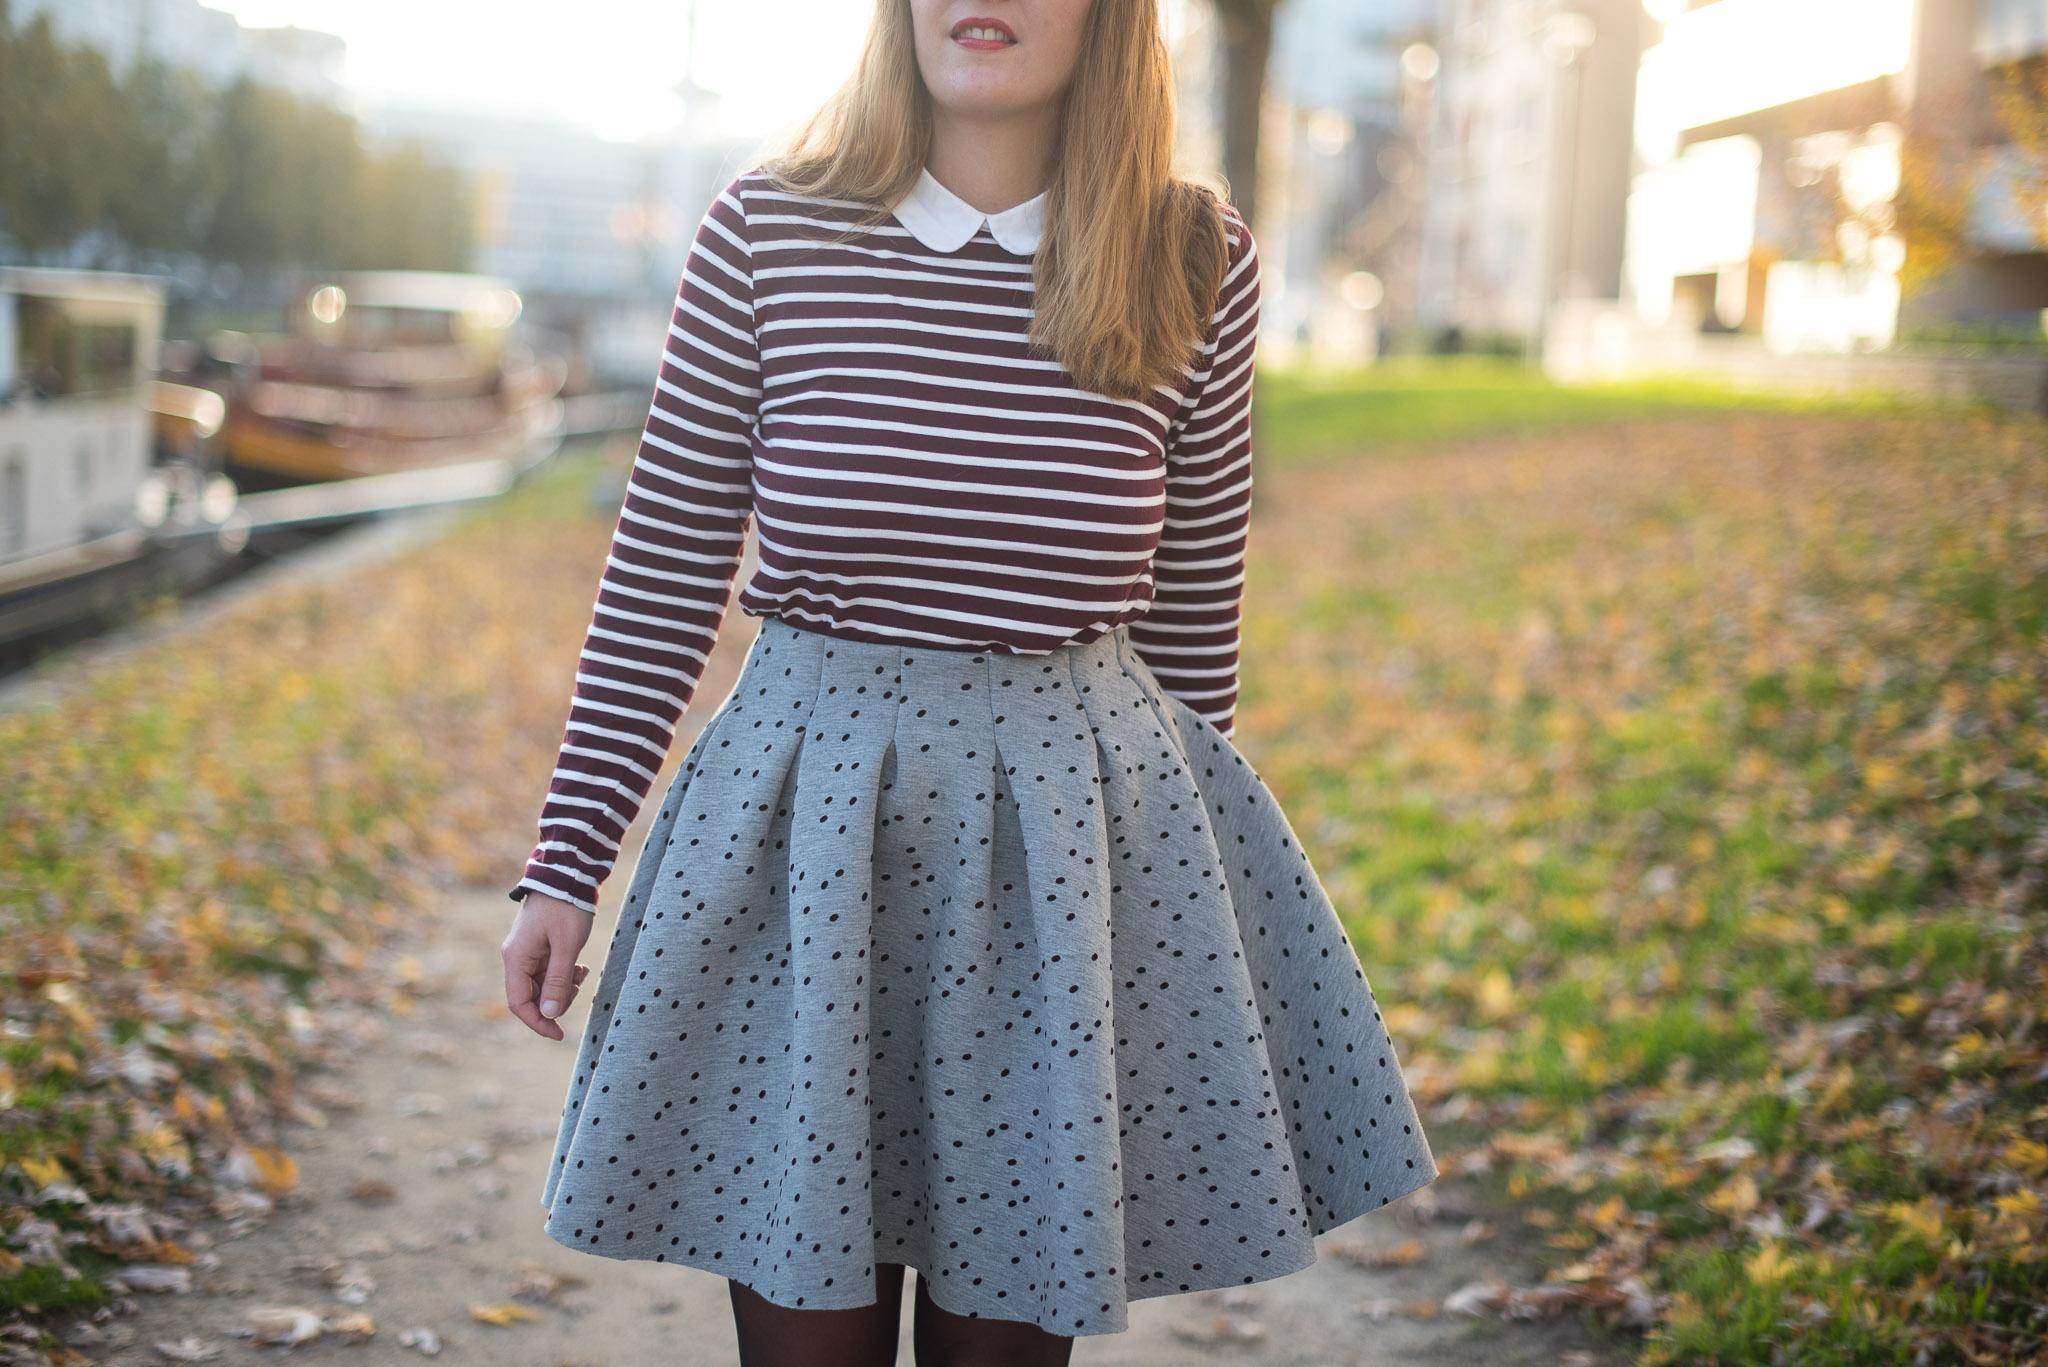 jupe-maje-mariniere-blog-mode-rennes-elofancy